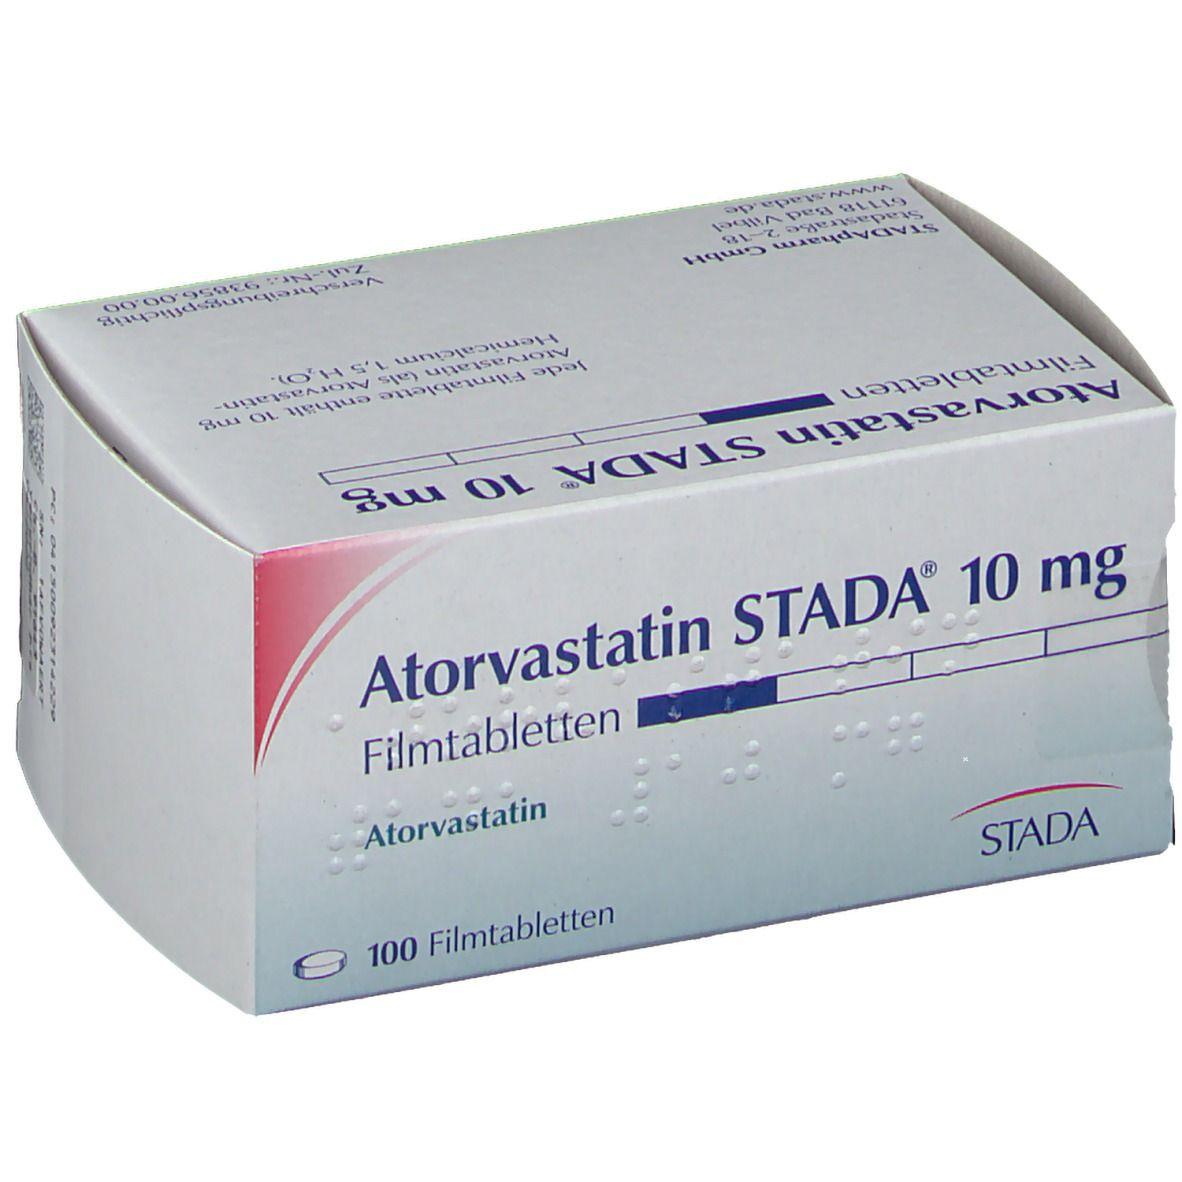 Atorvastatin Stada® 10 mg Filmtabletten